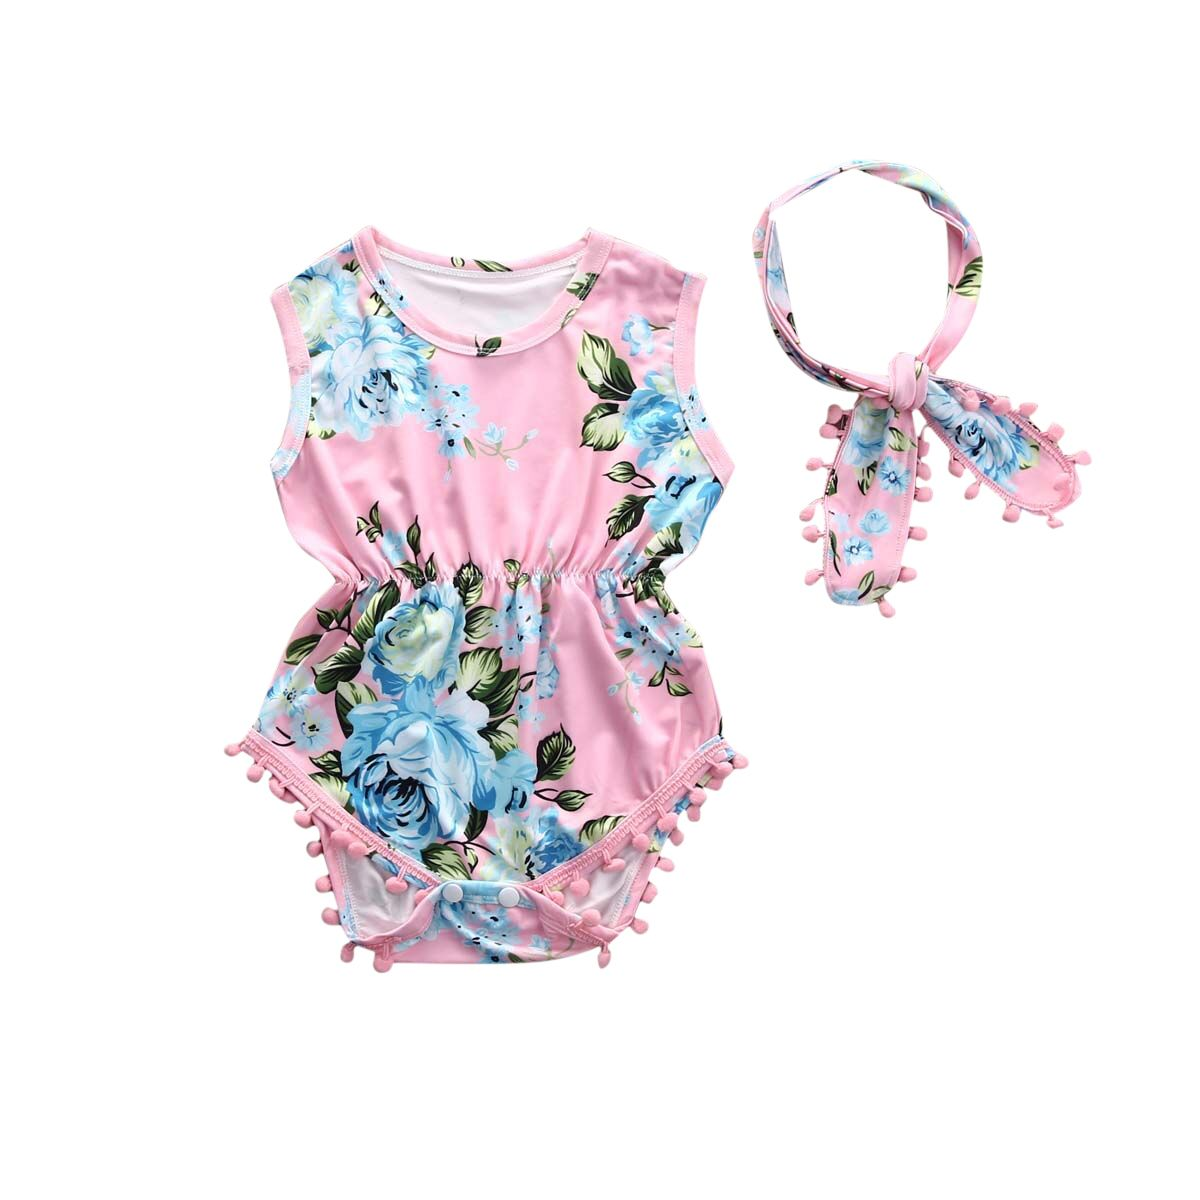 Headband Jumpsuit Sunsuit Outfits Adorable Baby Girls Floral Bodysuit Romper